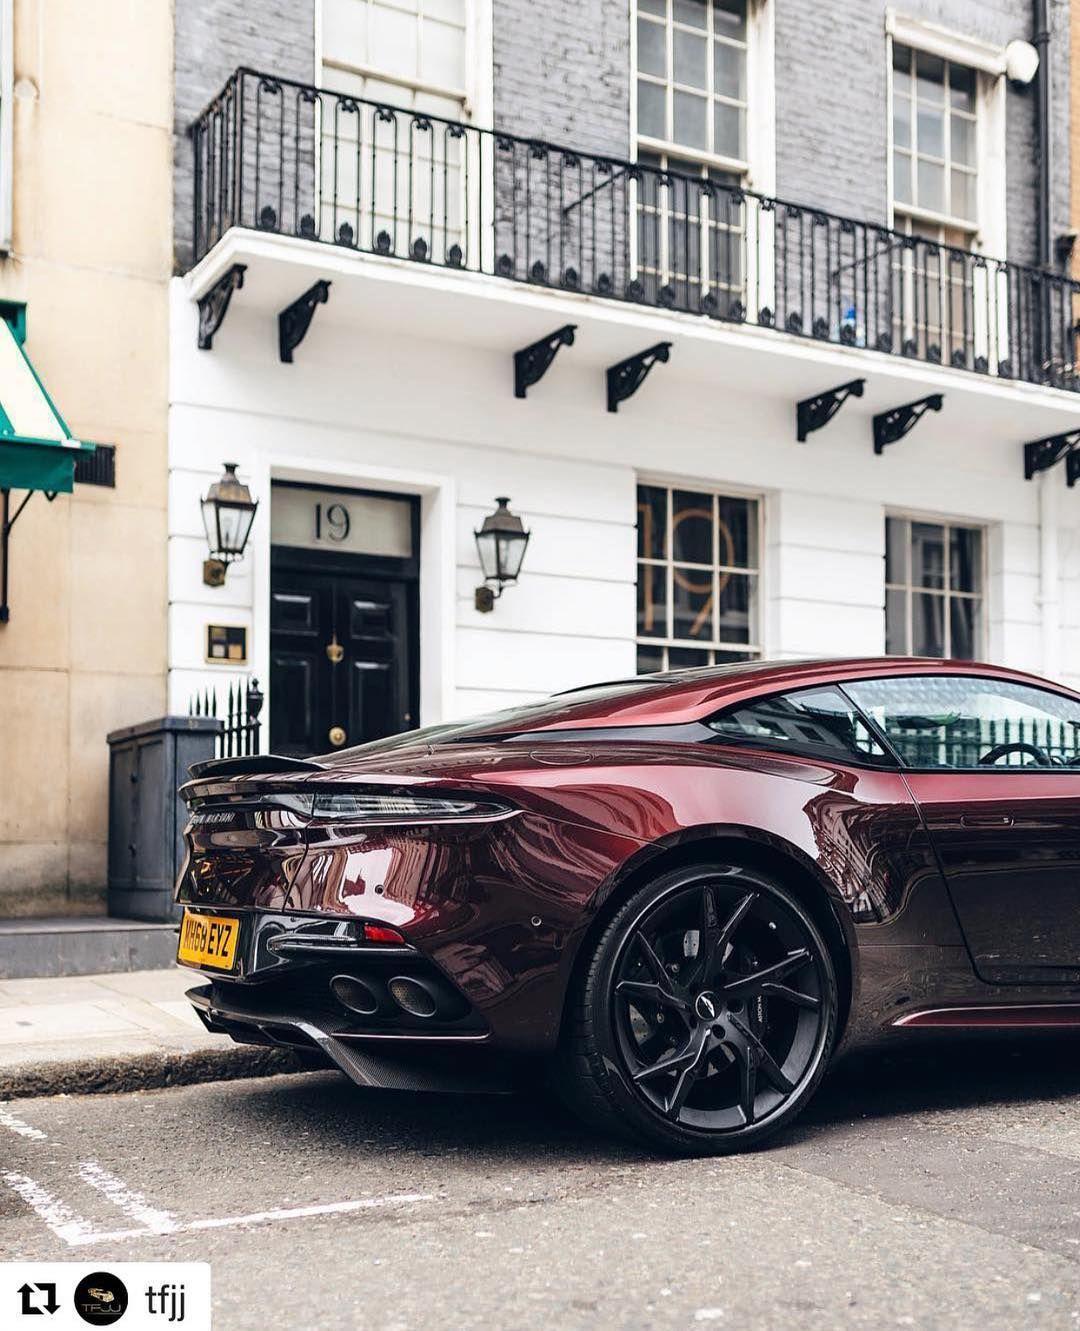 "Aston Martin News on Instagram: ""Another shot of the Divine Red DBS Superleggera? #astonmartin #dbs #superleggera #power #beauty #soul #sound #photooftheday #photography…"""